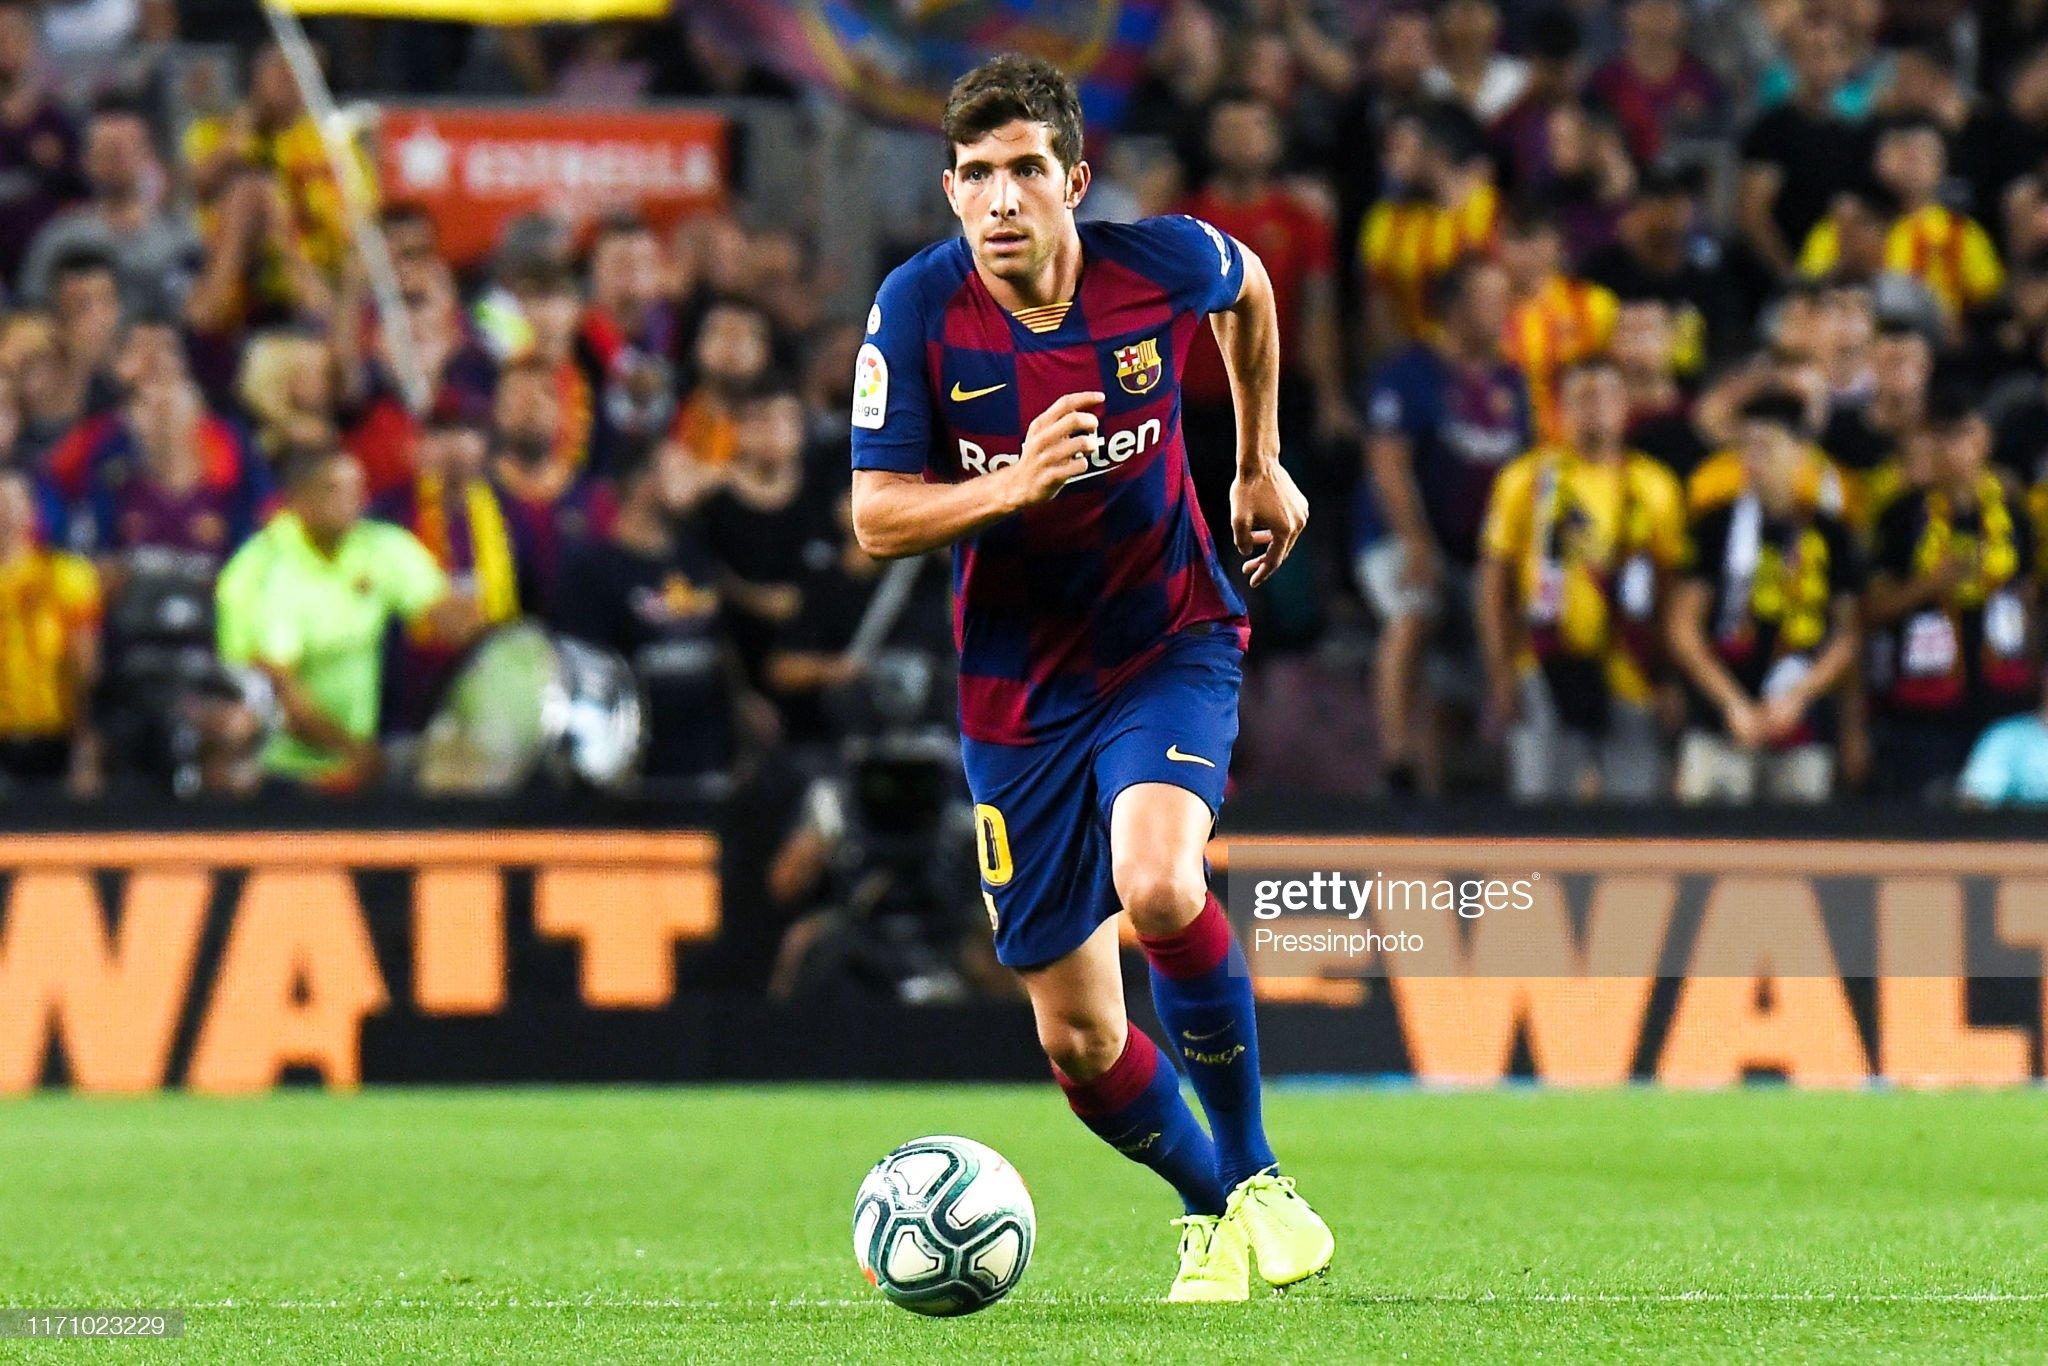 صور مباراة : برشلونة - فياريال 2-1 ( 24-09-2019 )  Sergi-roberto-of-fc-barcelona-during-the-liga-match-between-barcelona-picture-id1171023229?s=2048x2048